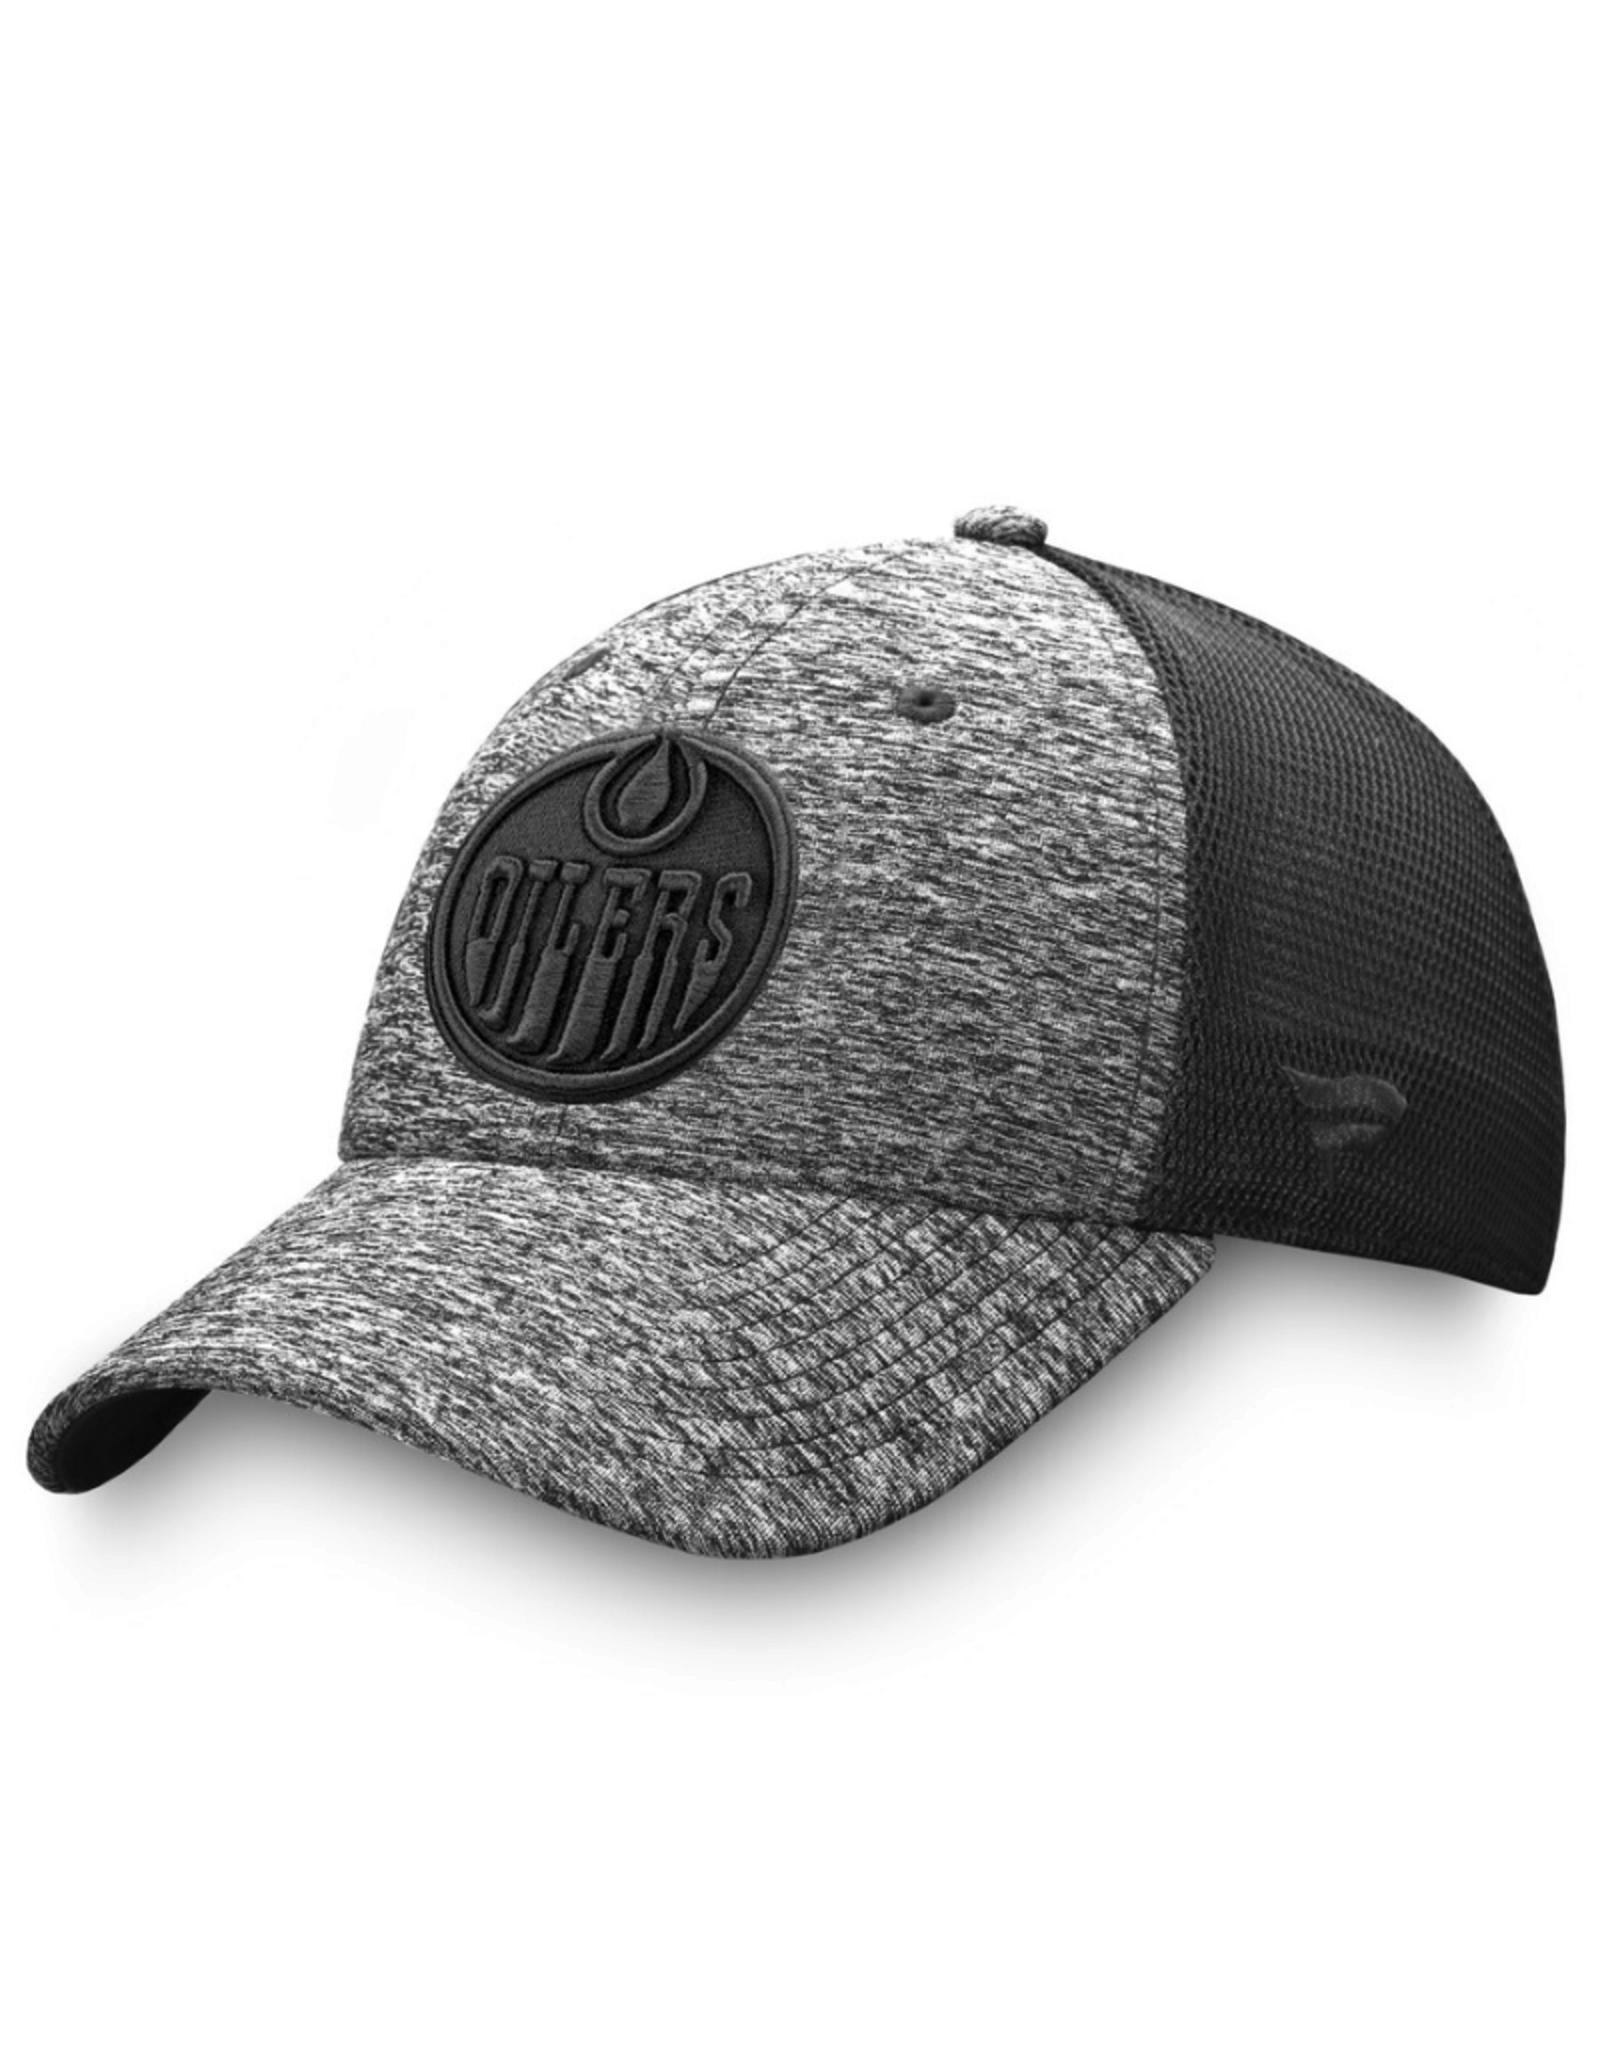 Fanatics Fanatics Men's Black Ice Stretch Fit Hat Edmonton Oilers Black